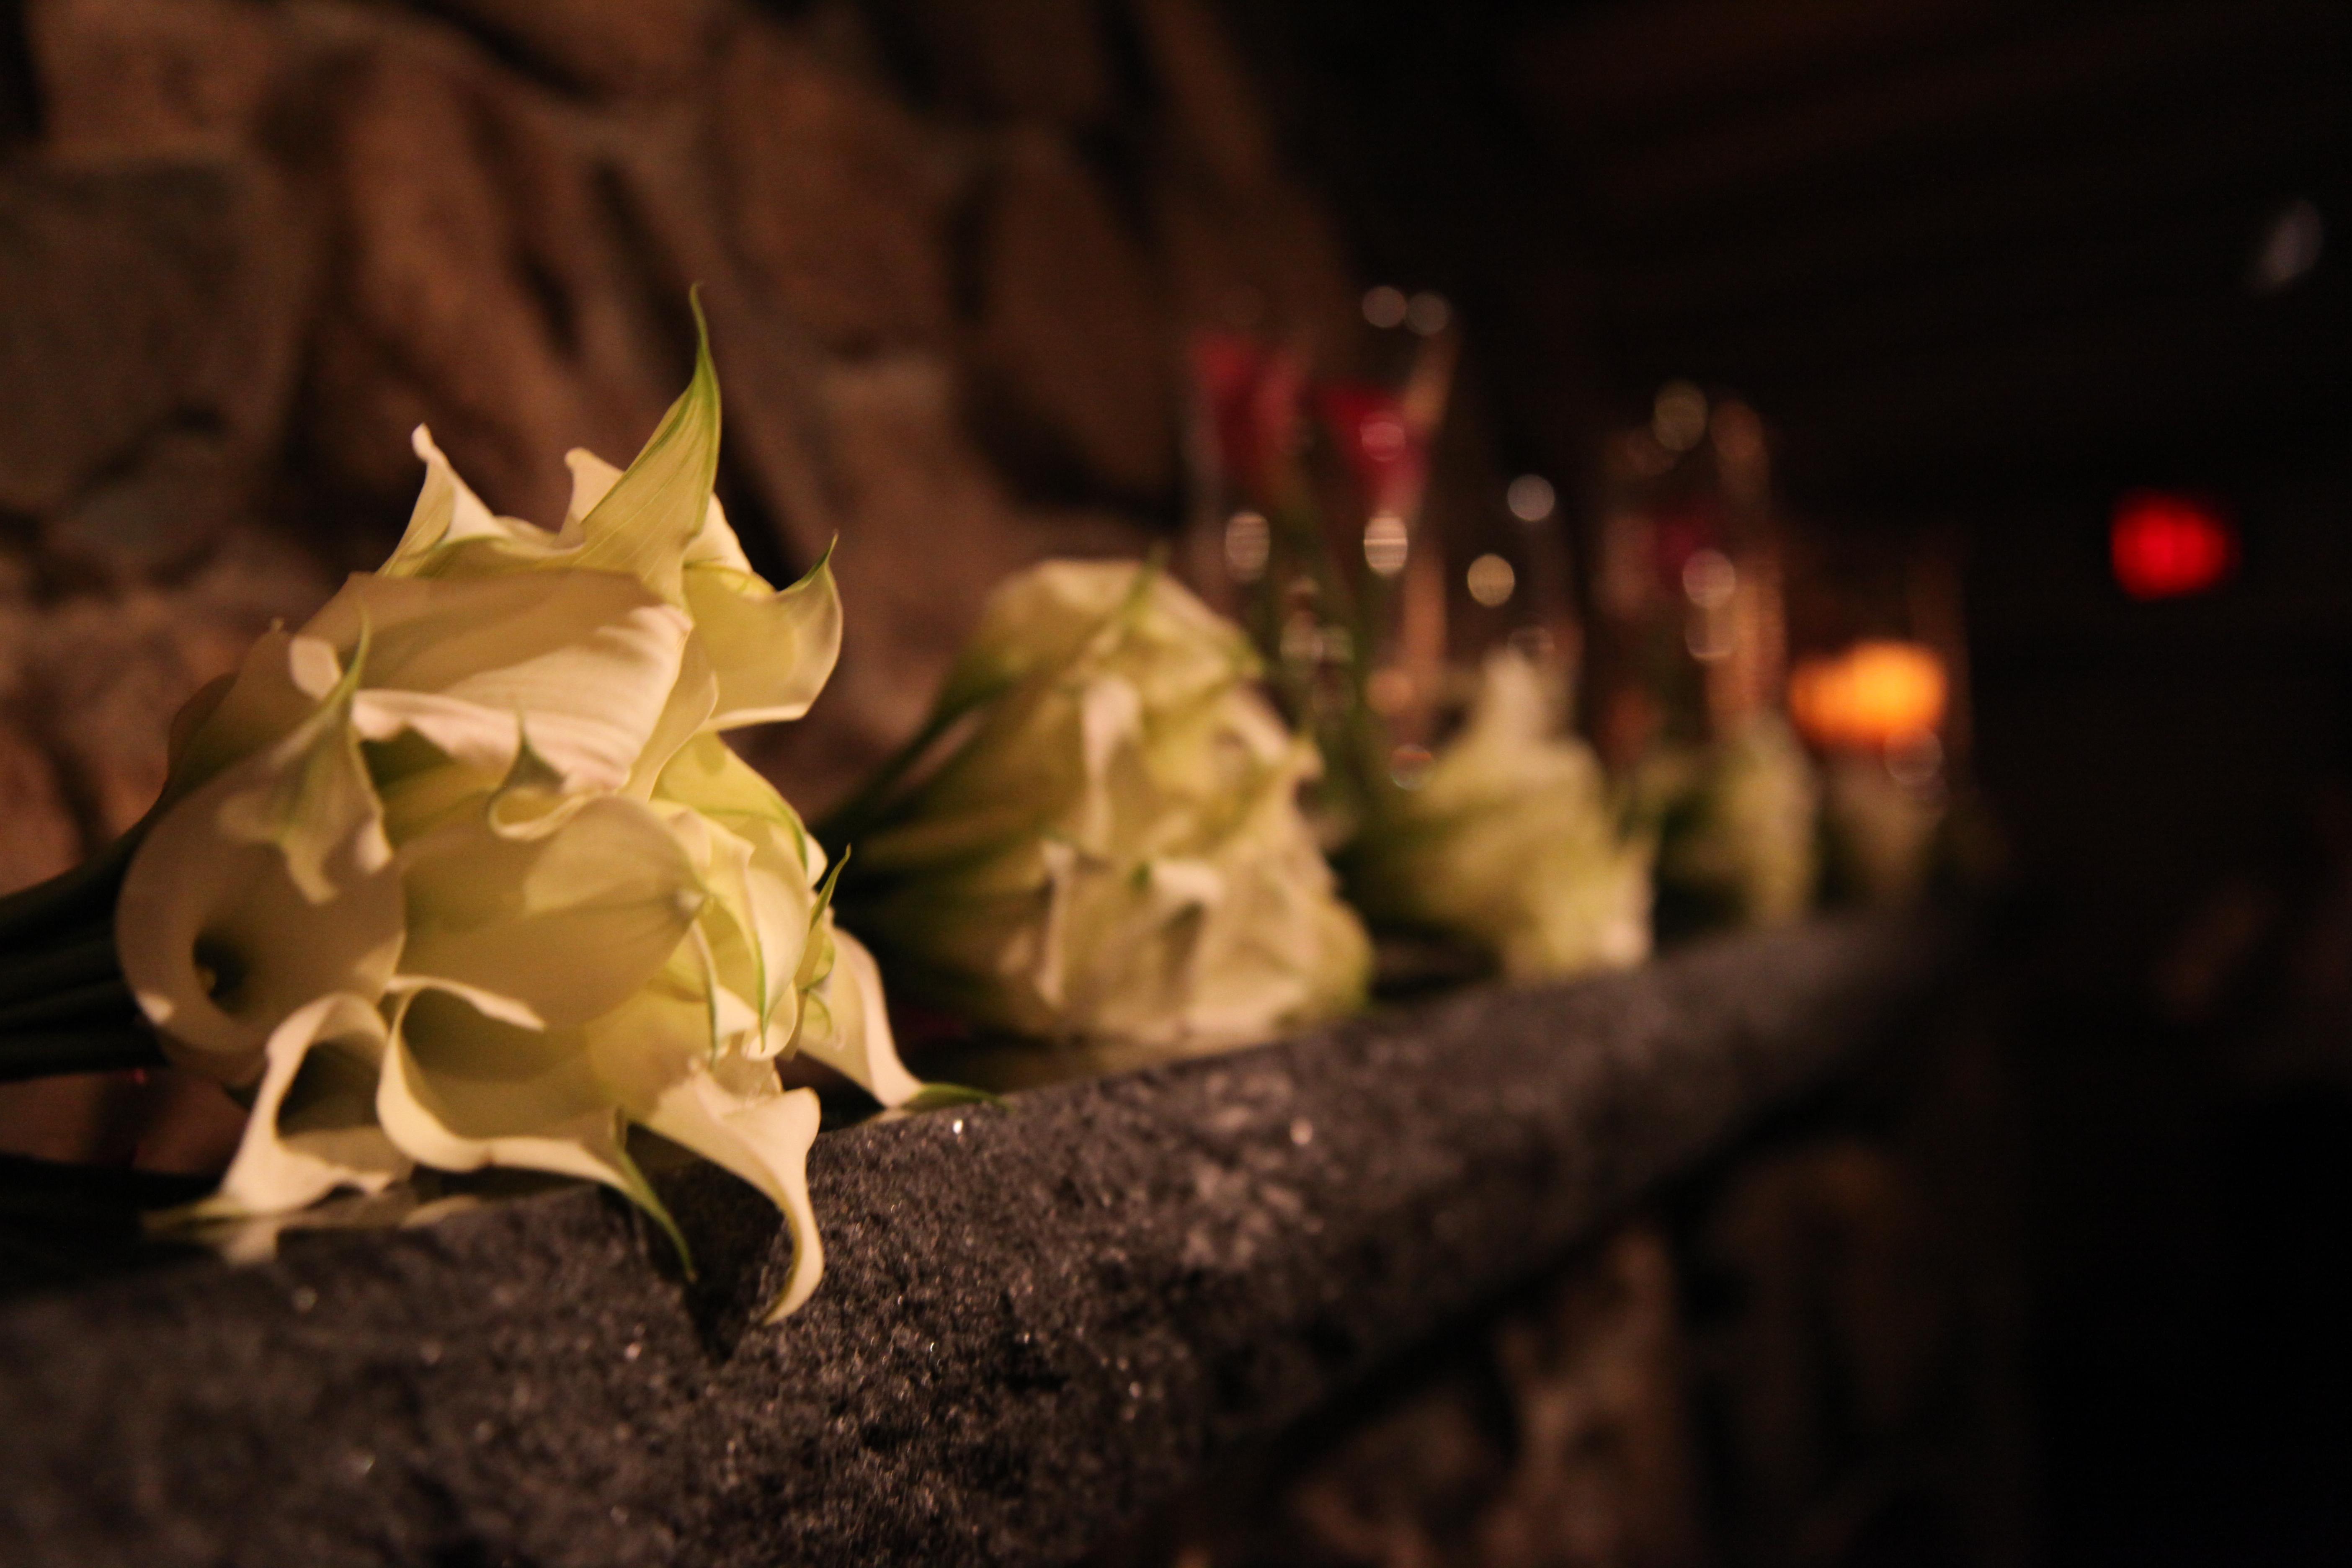 Wedding Flowers on the mantel